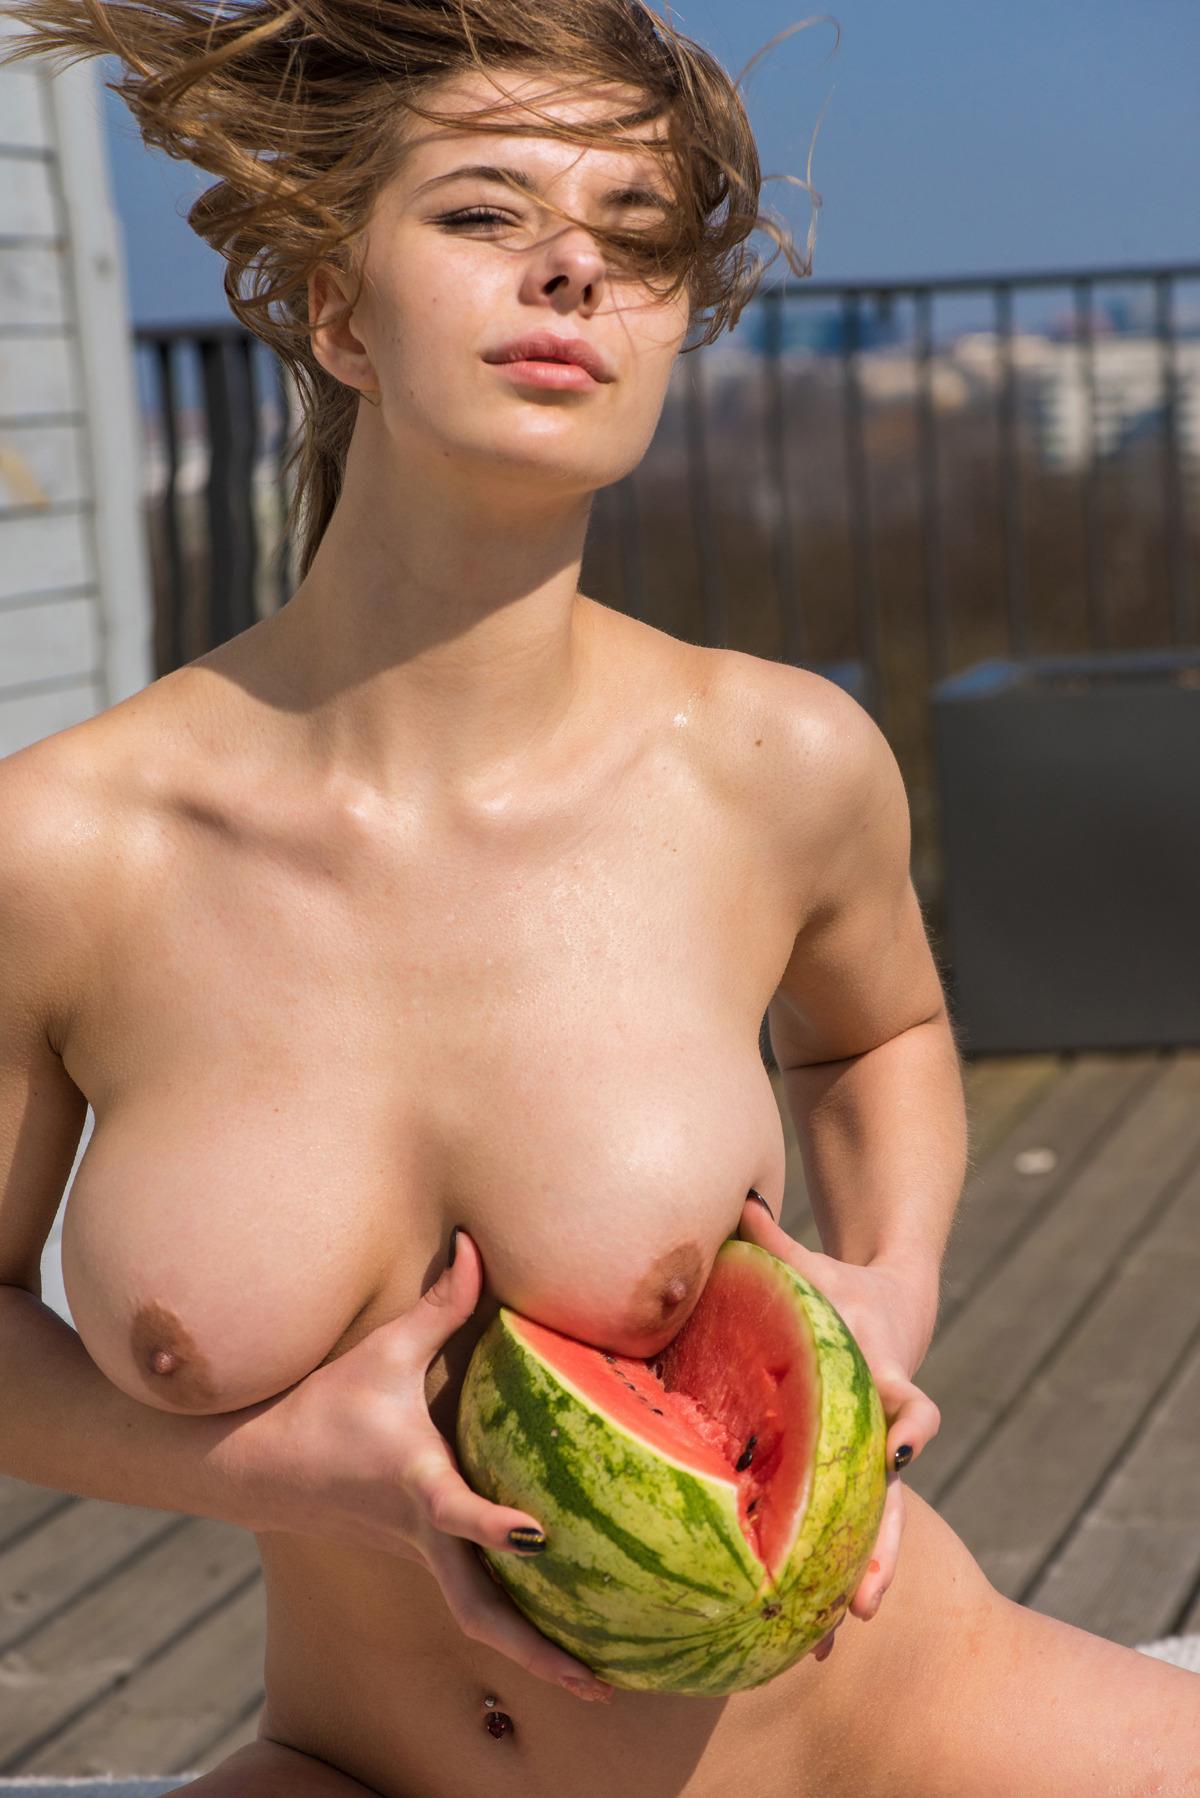 Кушает арбузик